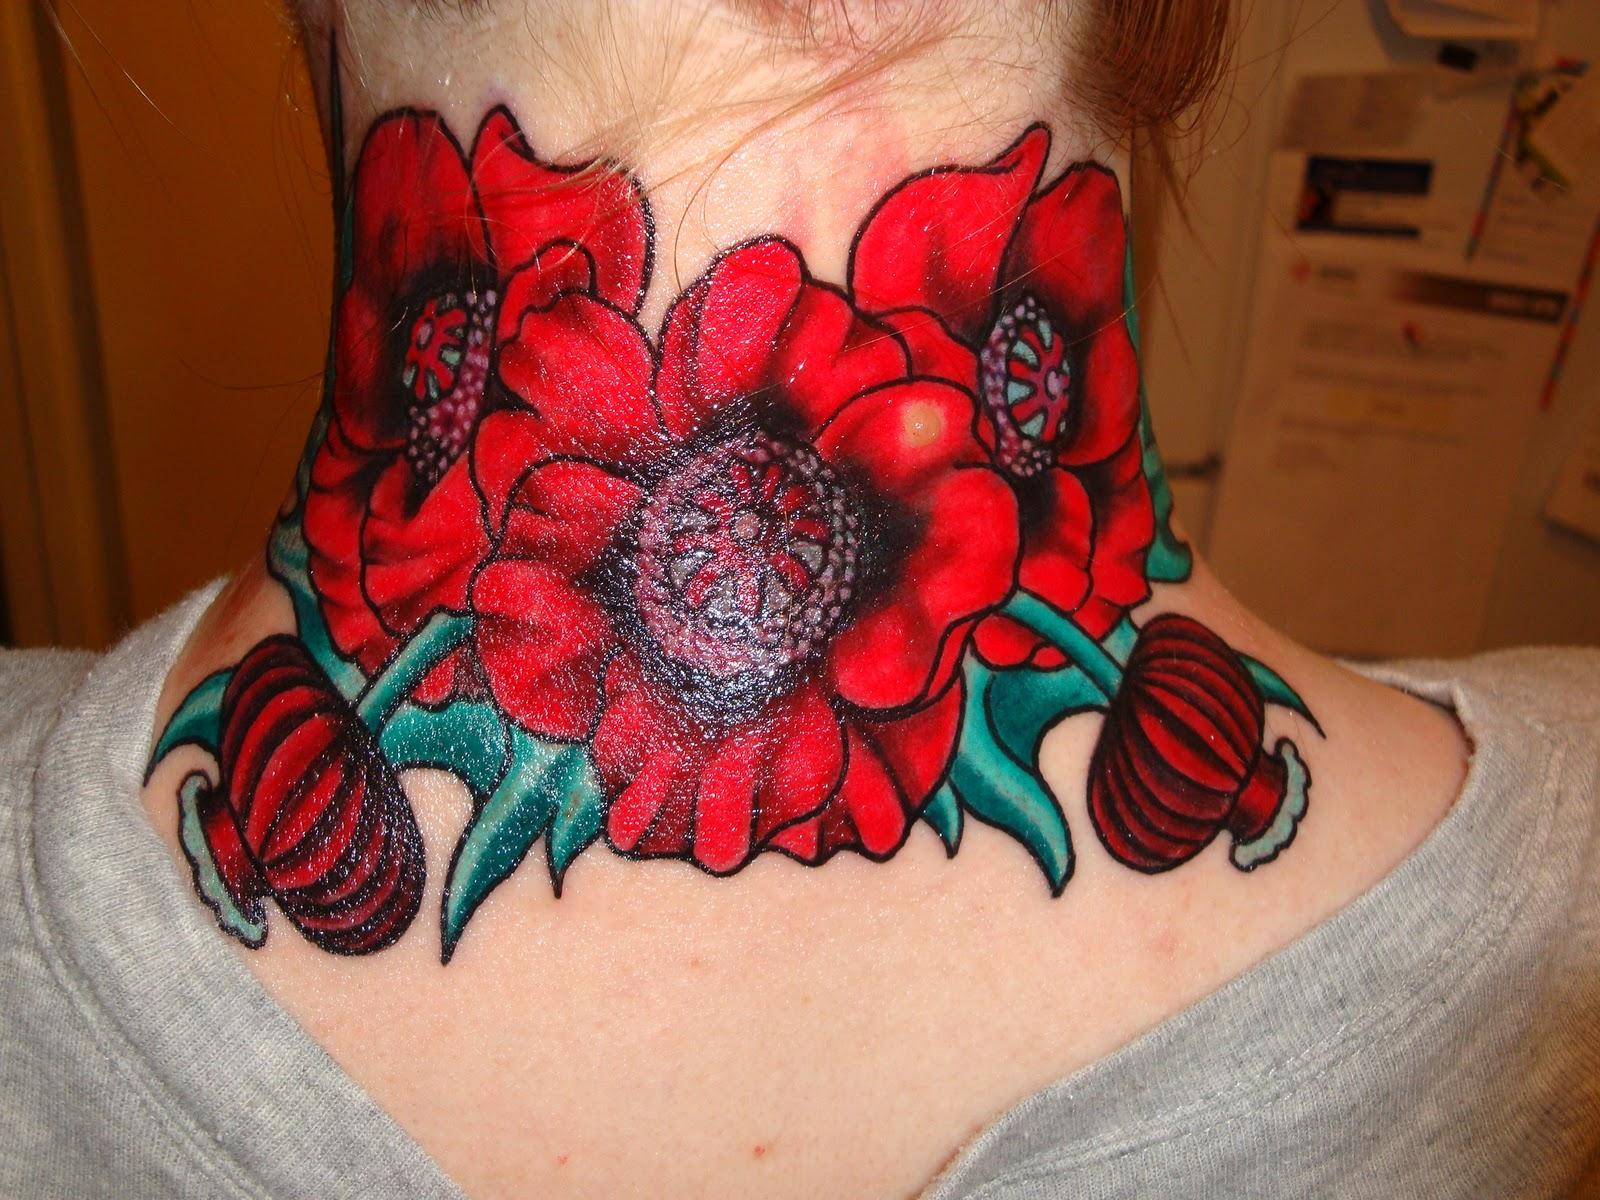 Best Tattoos For Men Poppy Tattoo